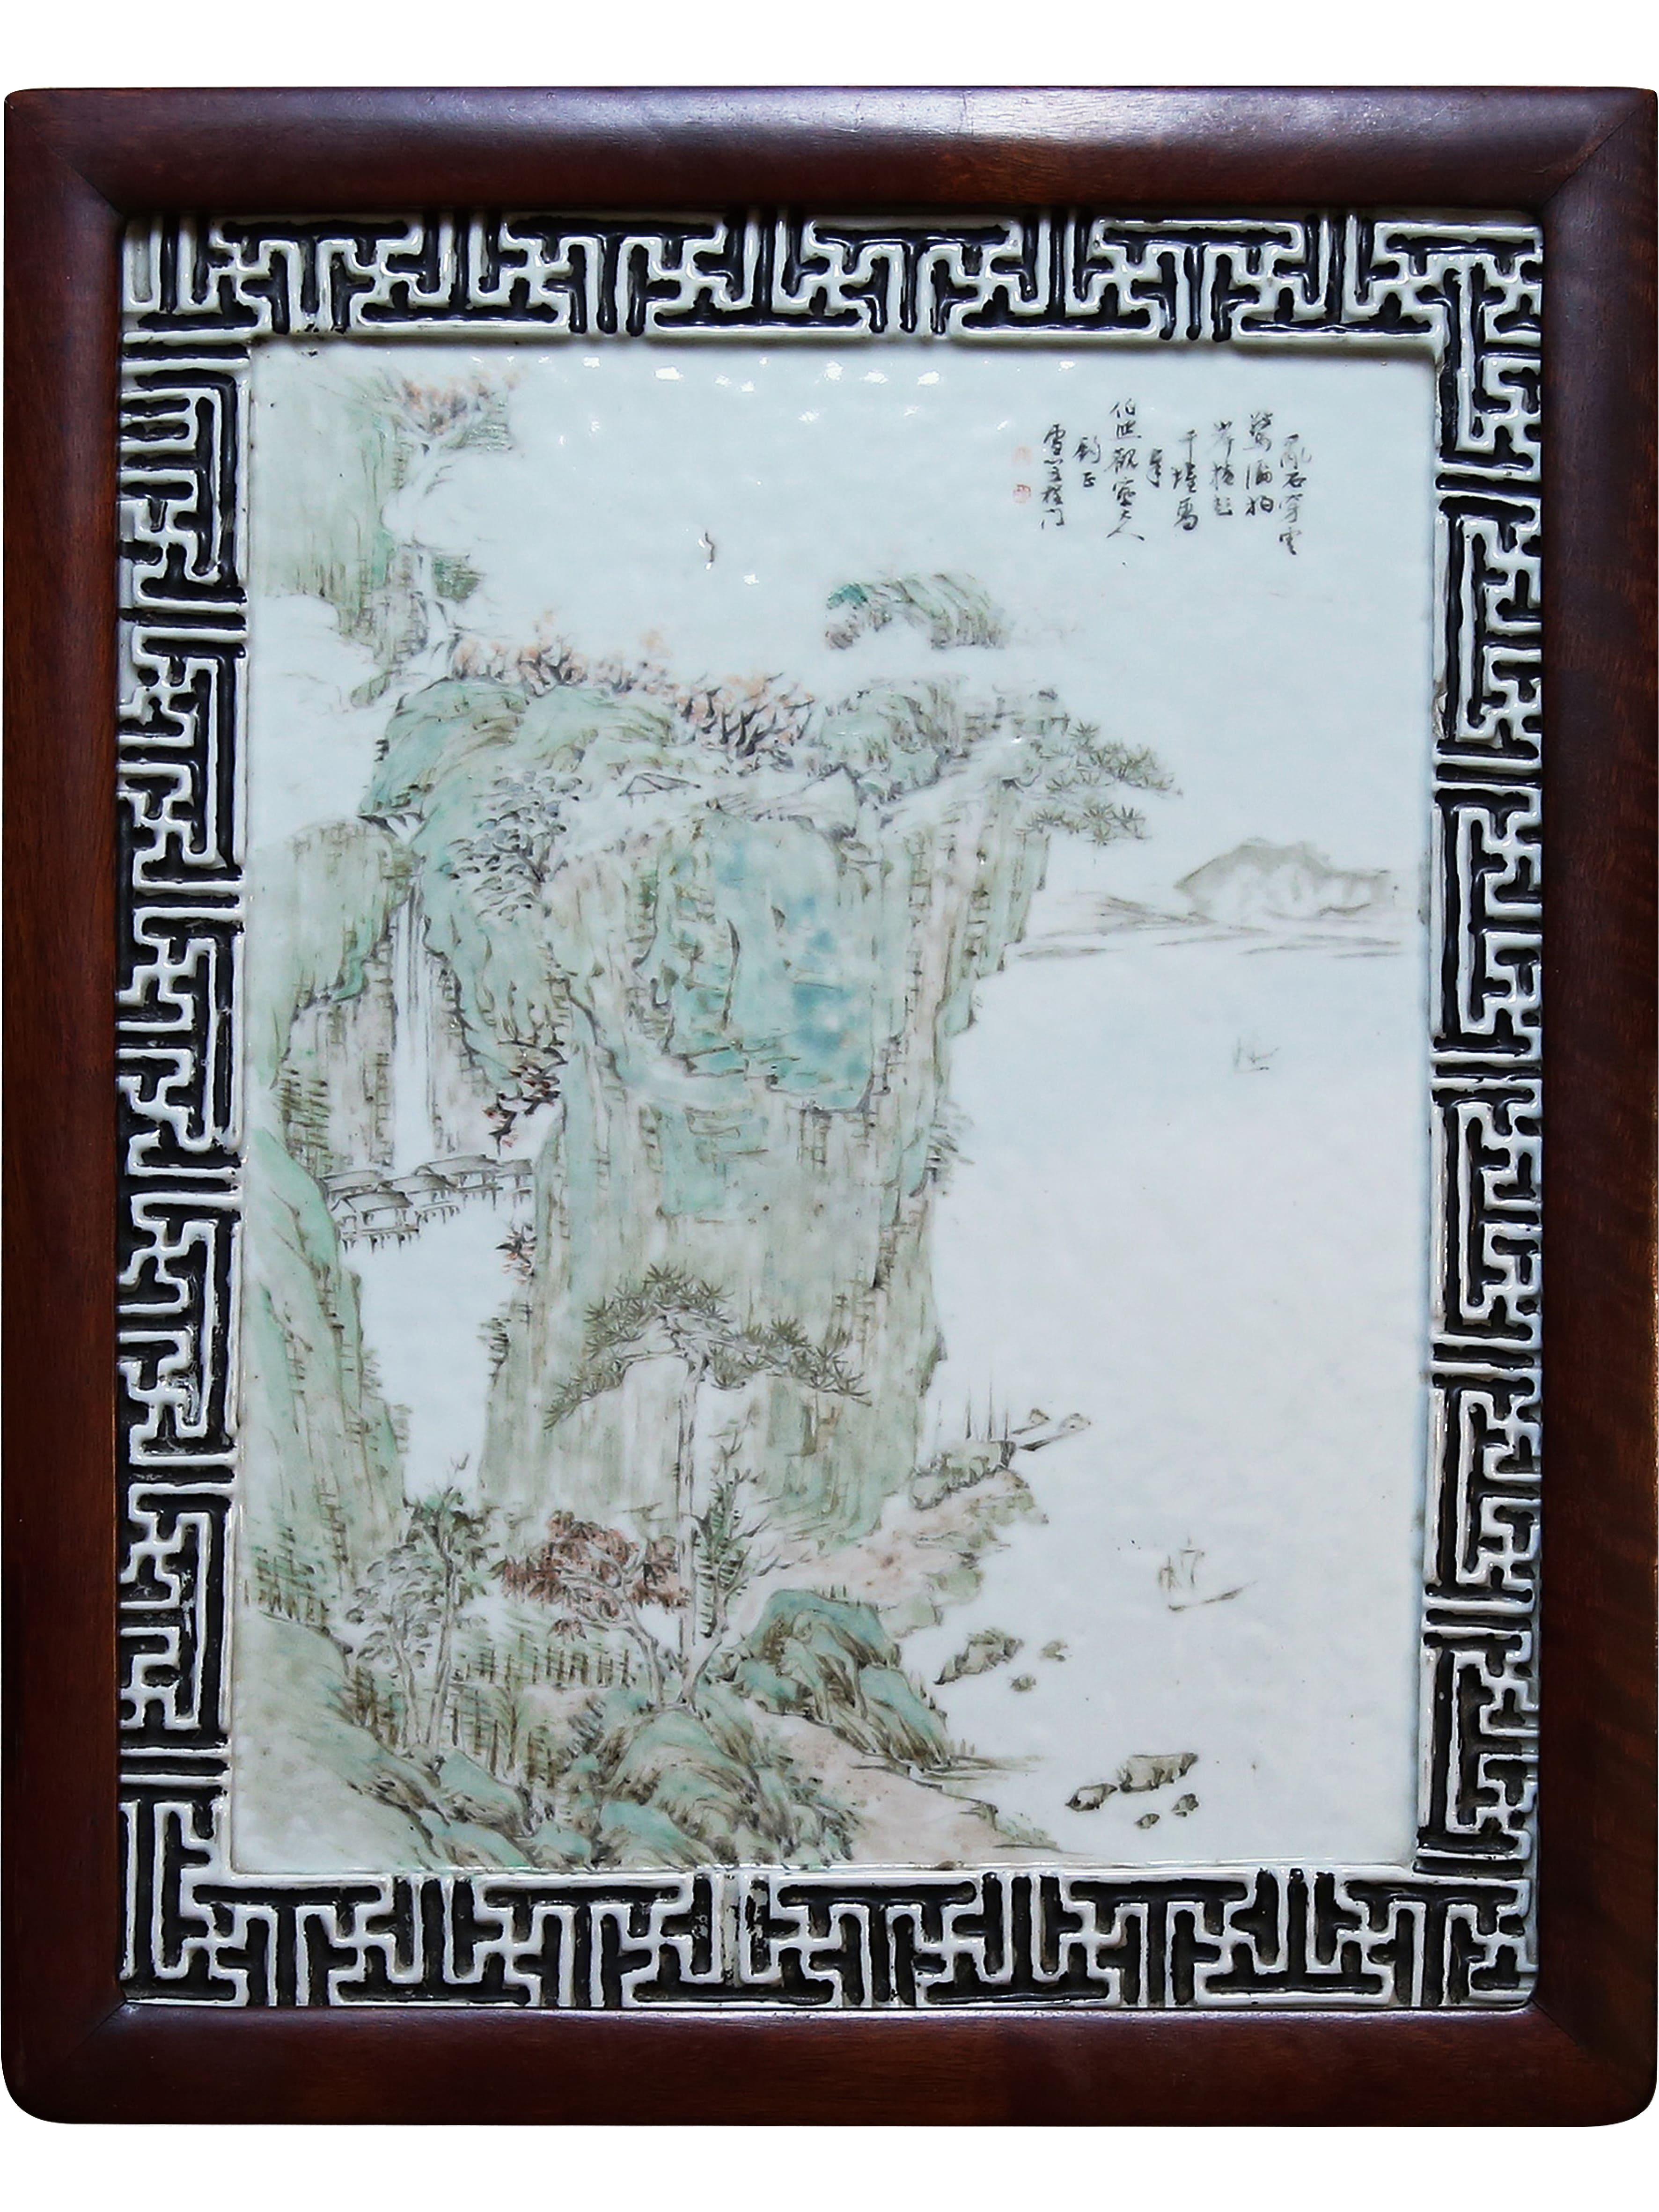 Lot 45 - A 'Qianjiang' School enameled rectangular landscape panel by Cheng Men late Qing Dynasty